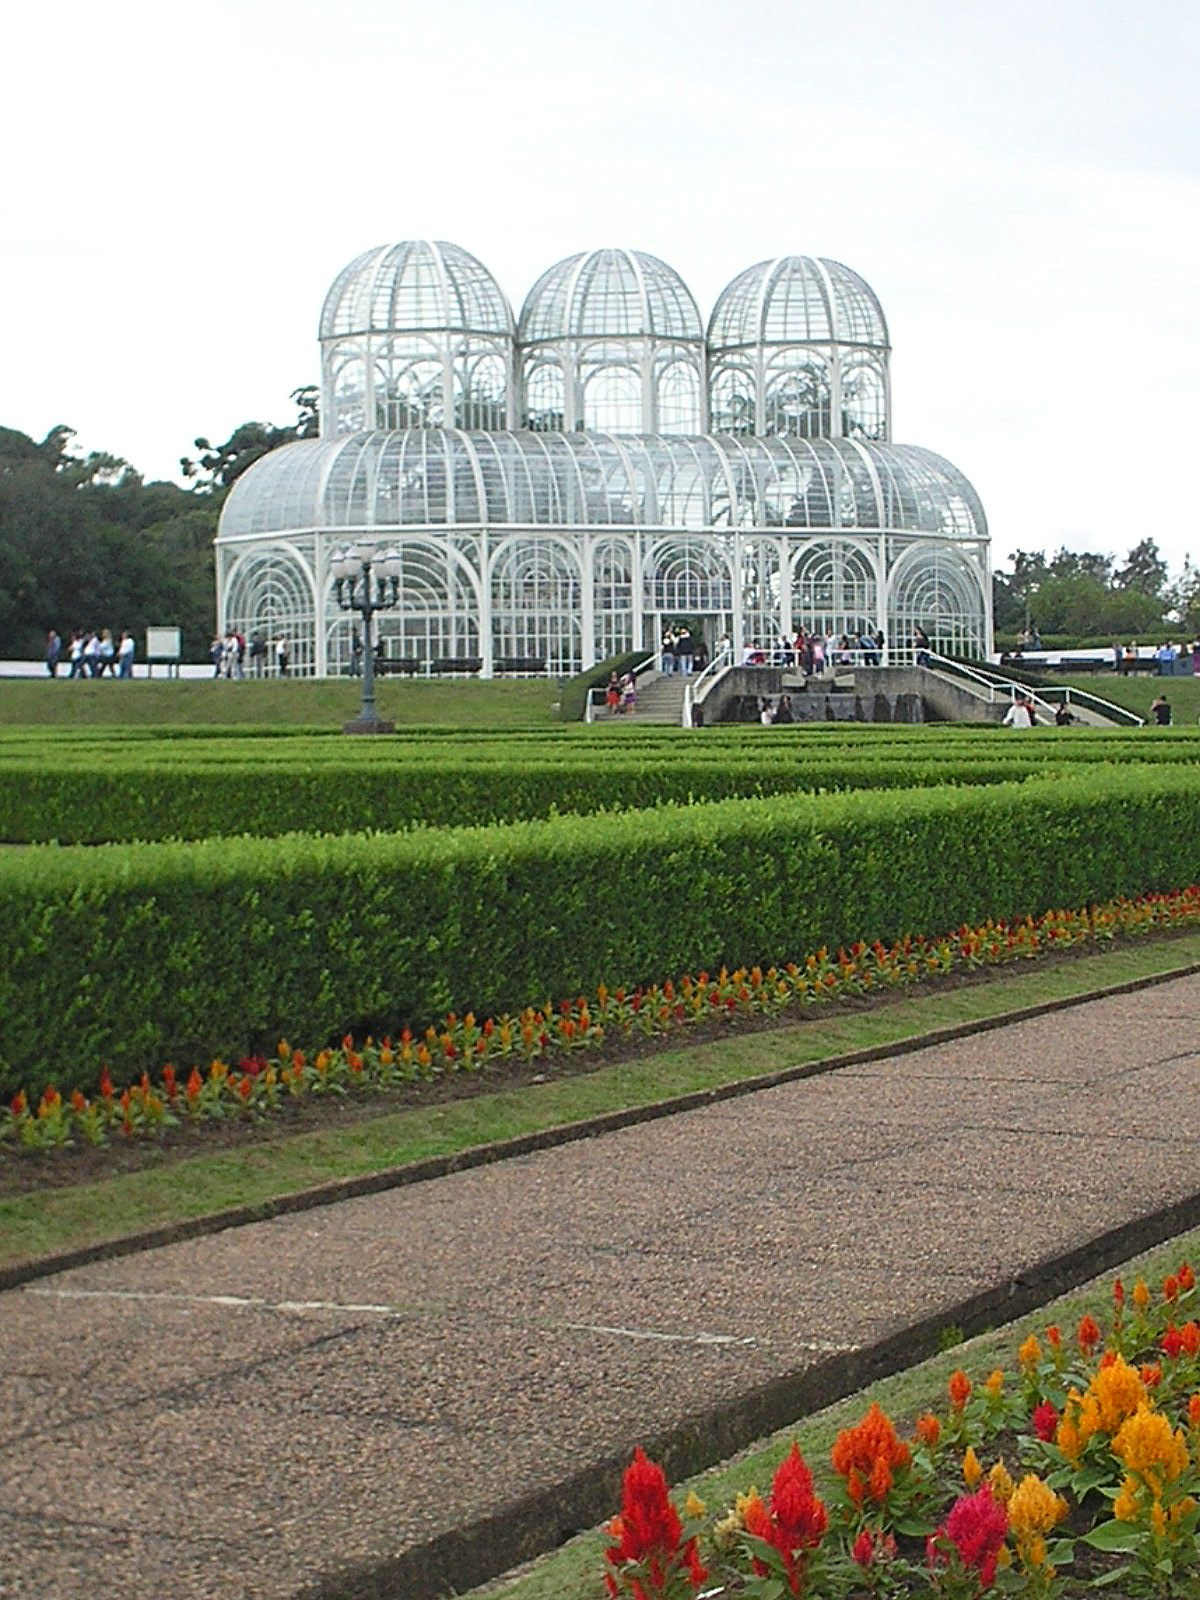 Greenhouse - Simple English Wikipedia, the free encyclopedia